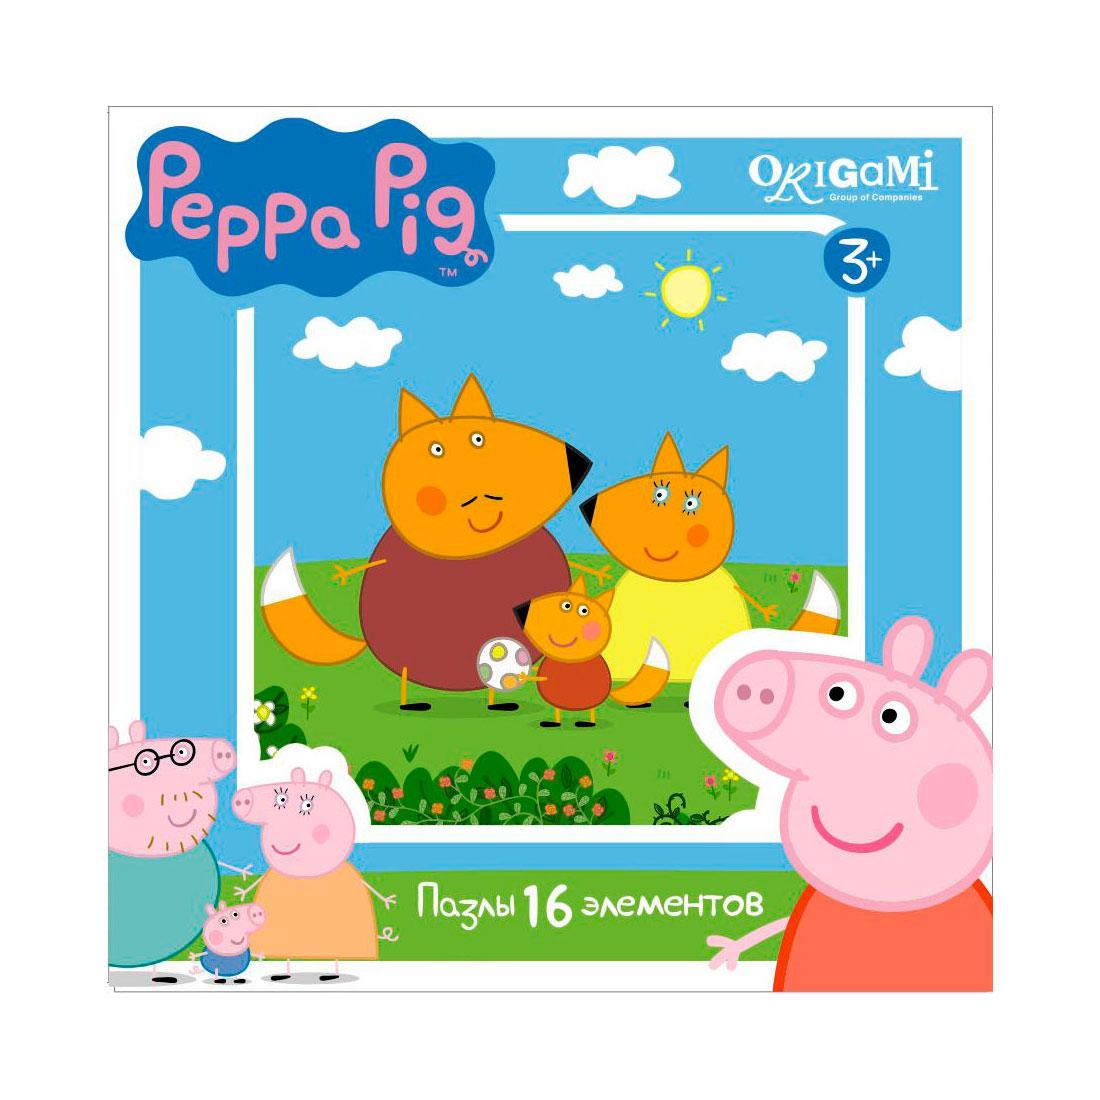 ���� Origami Peppa Pig 01579